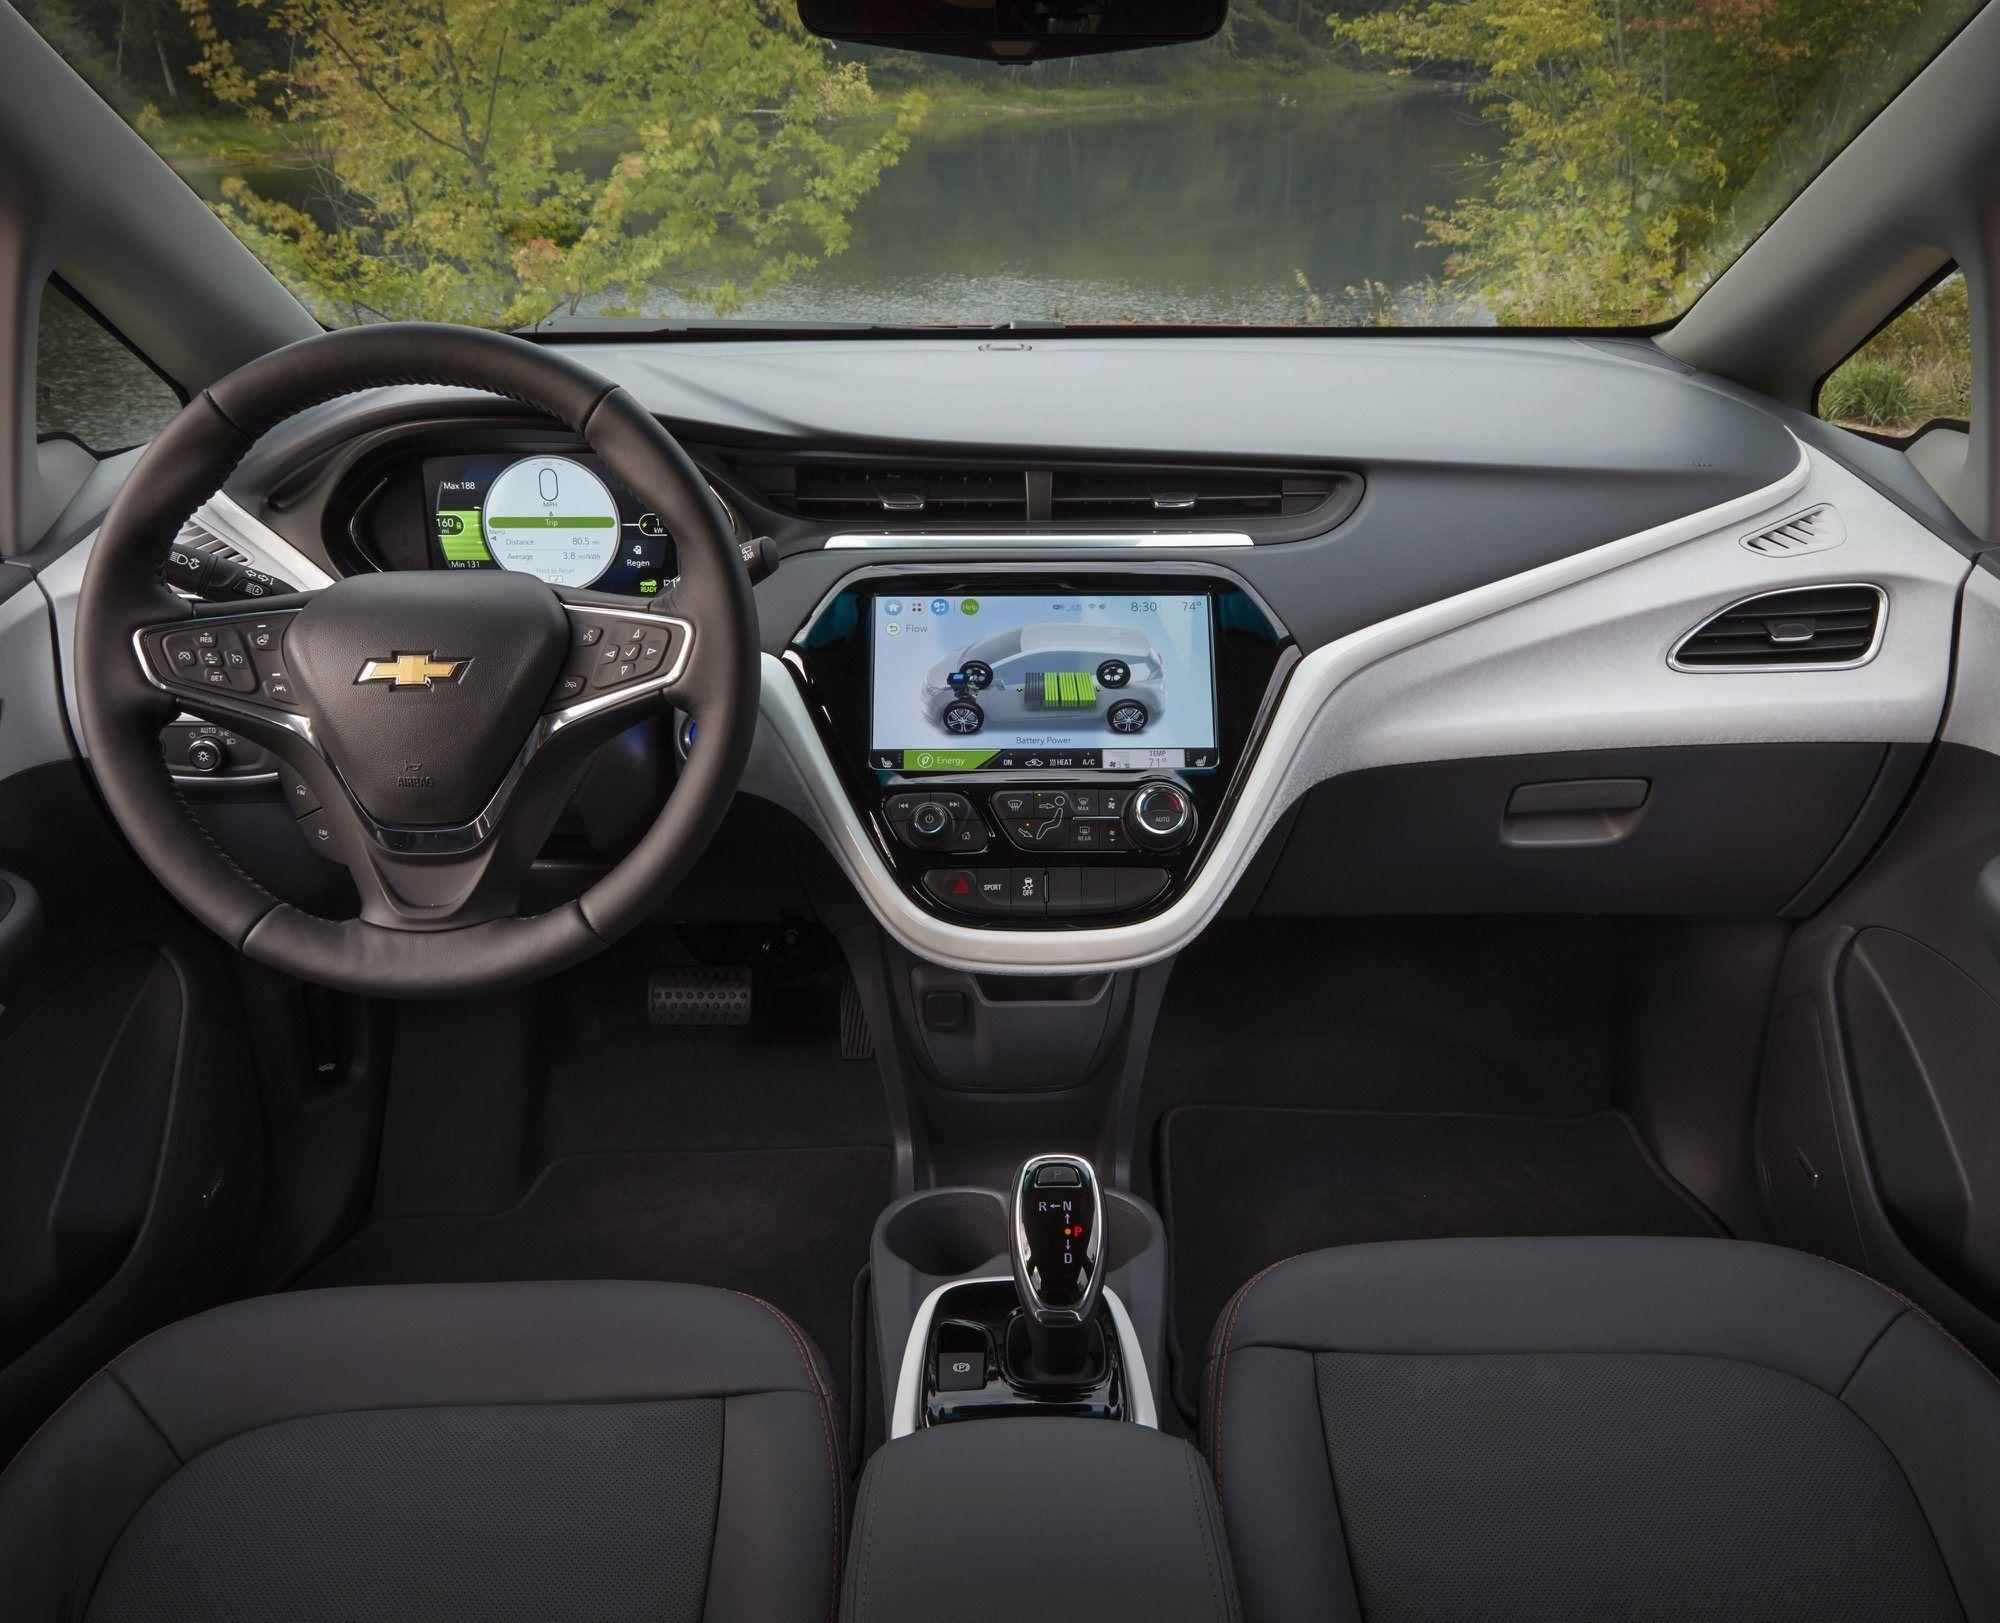 2021 Citroen C4 New Concept Chevrolet Volt Chevrolet Citroën C4